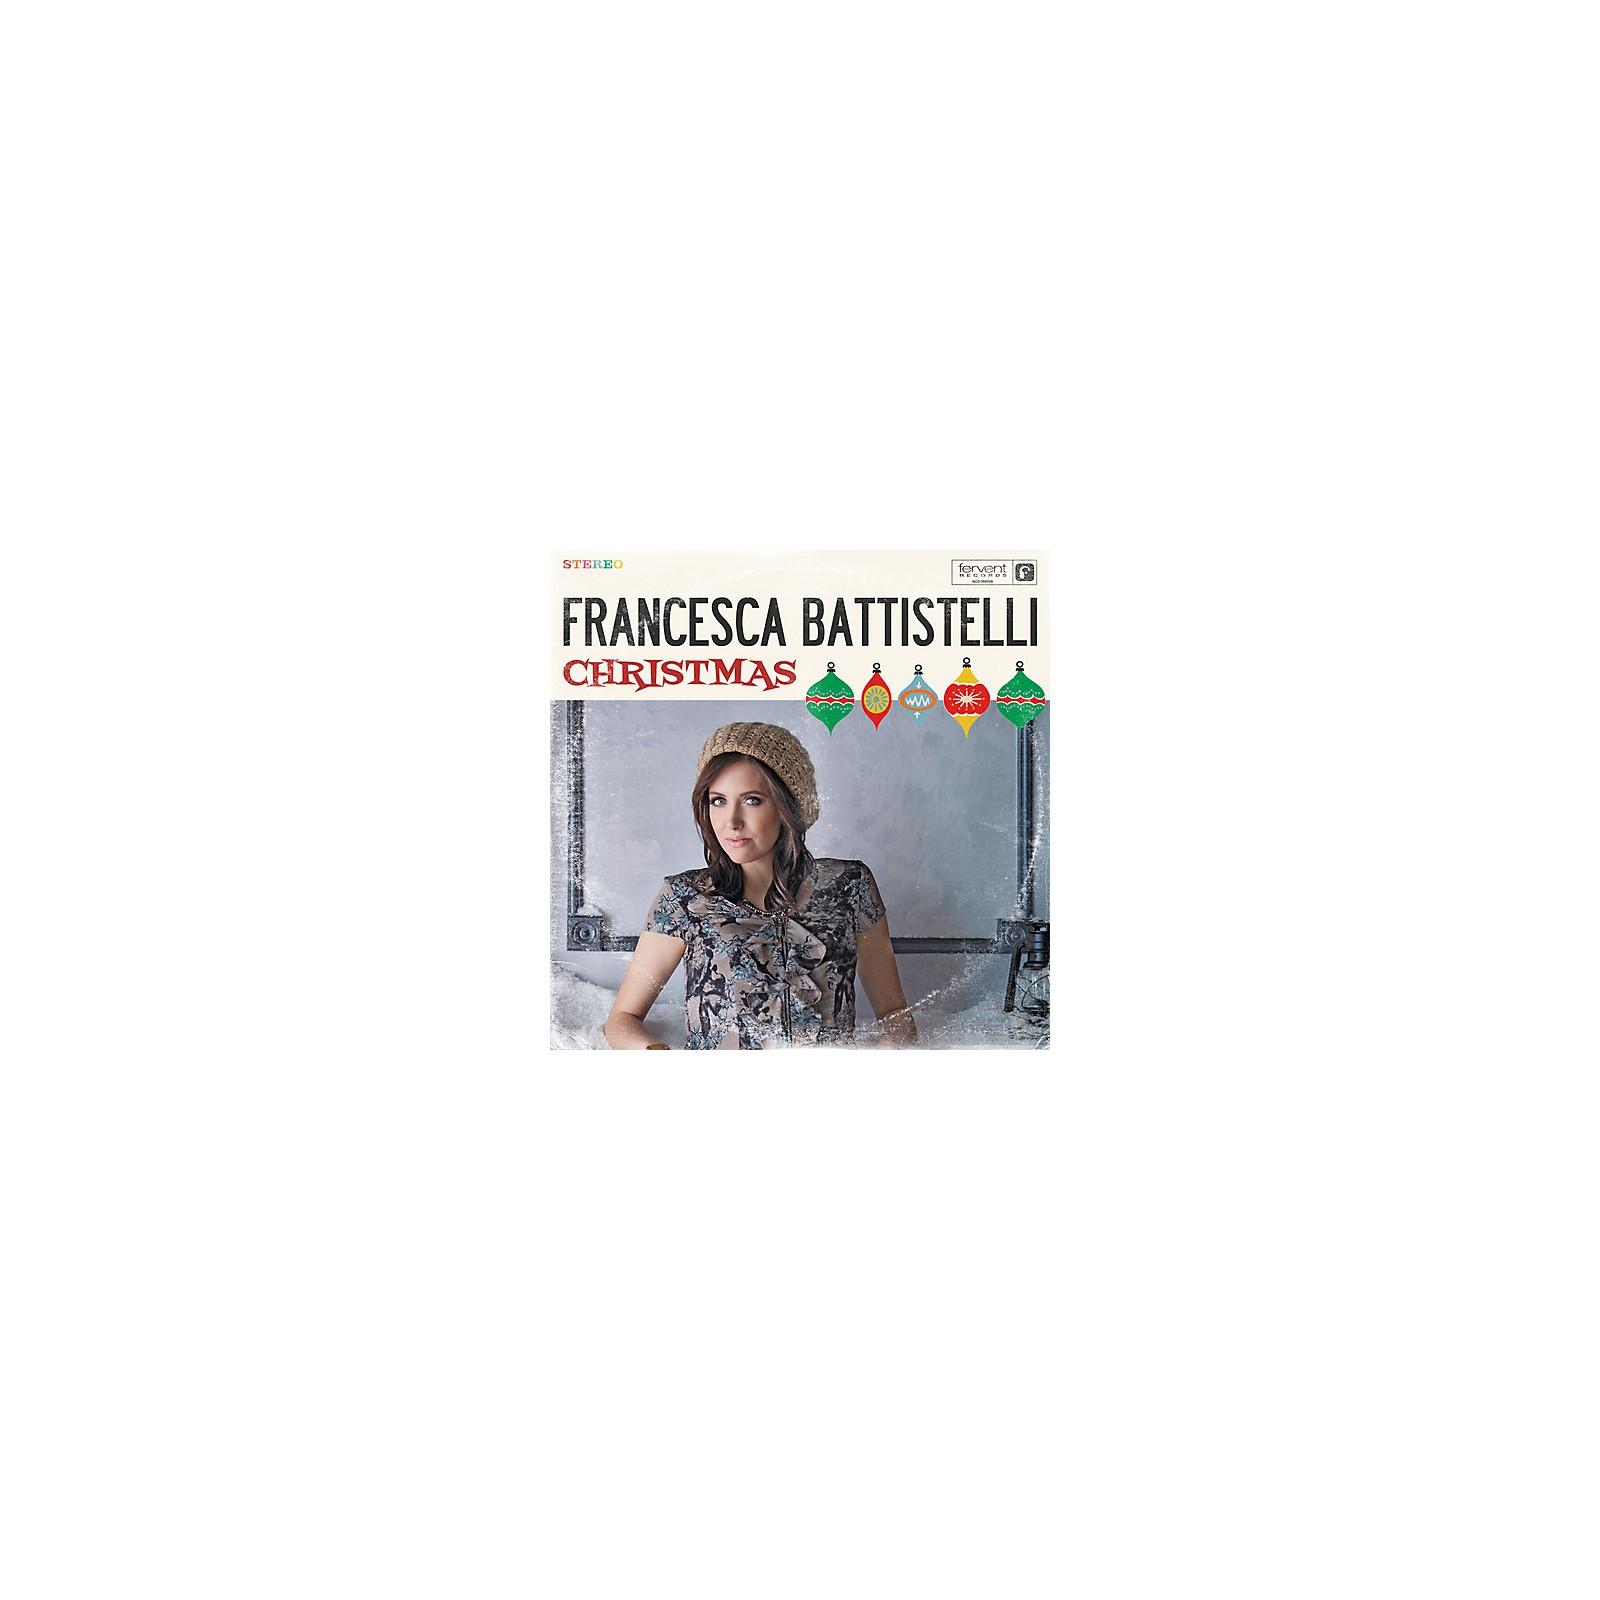 Alliance Francesca Battistelli - Christmas